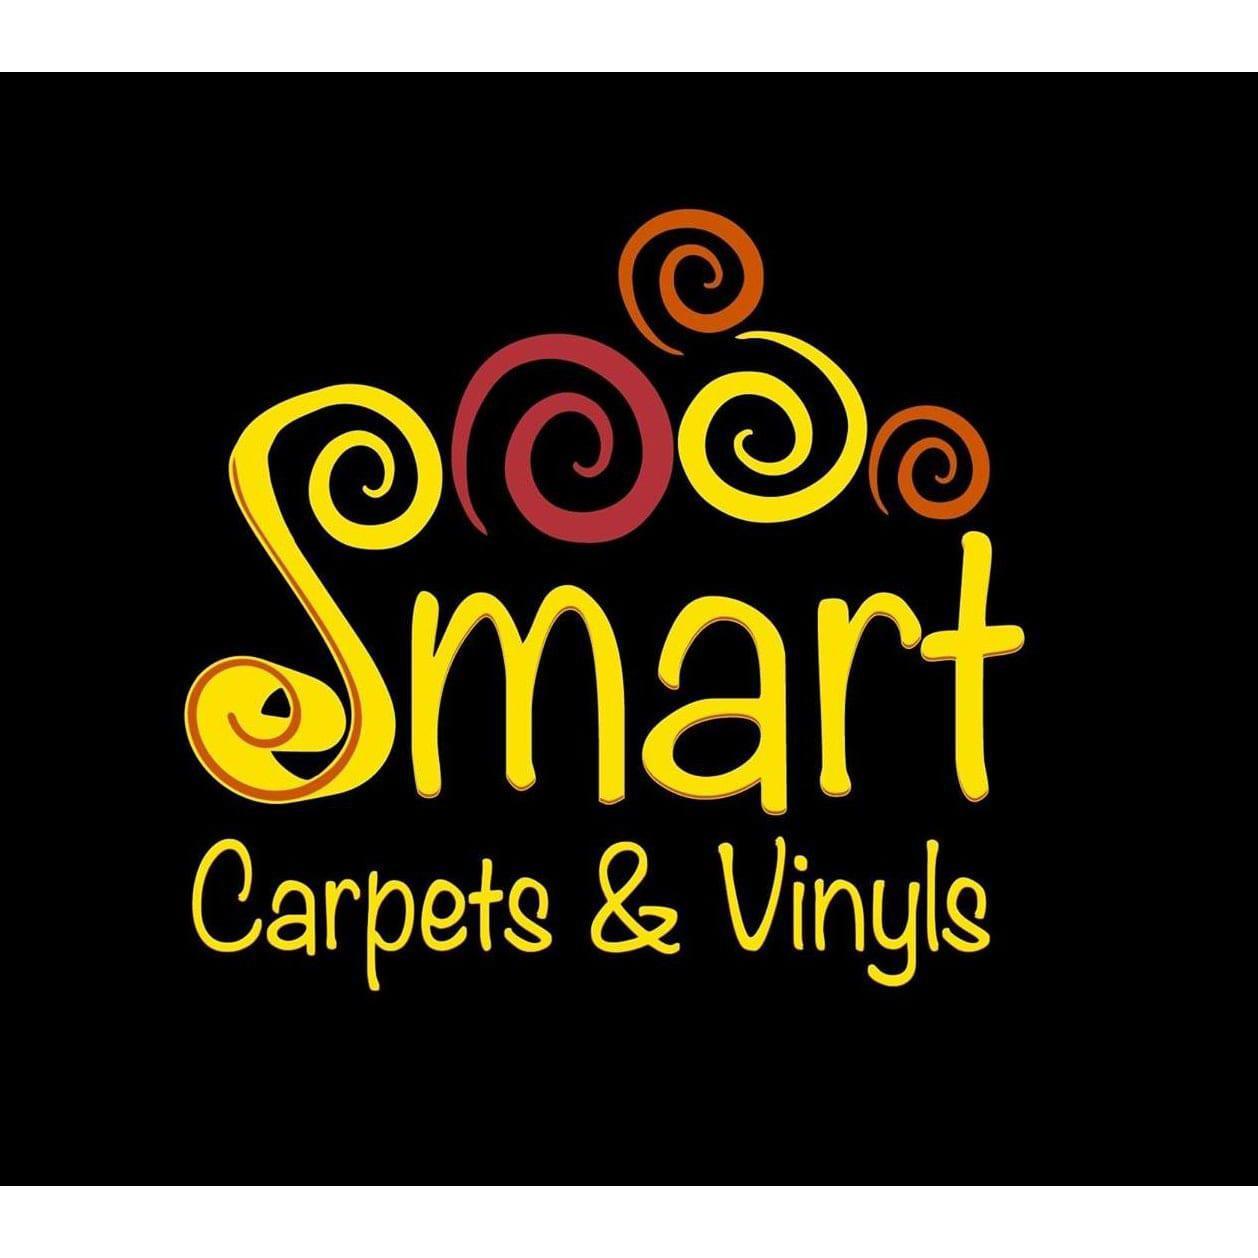 Smart Carpets & Vinyls - Wirral, Merseyside CH46 5NA - 07397 538846 | ShowMeLocal.com